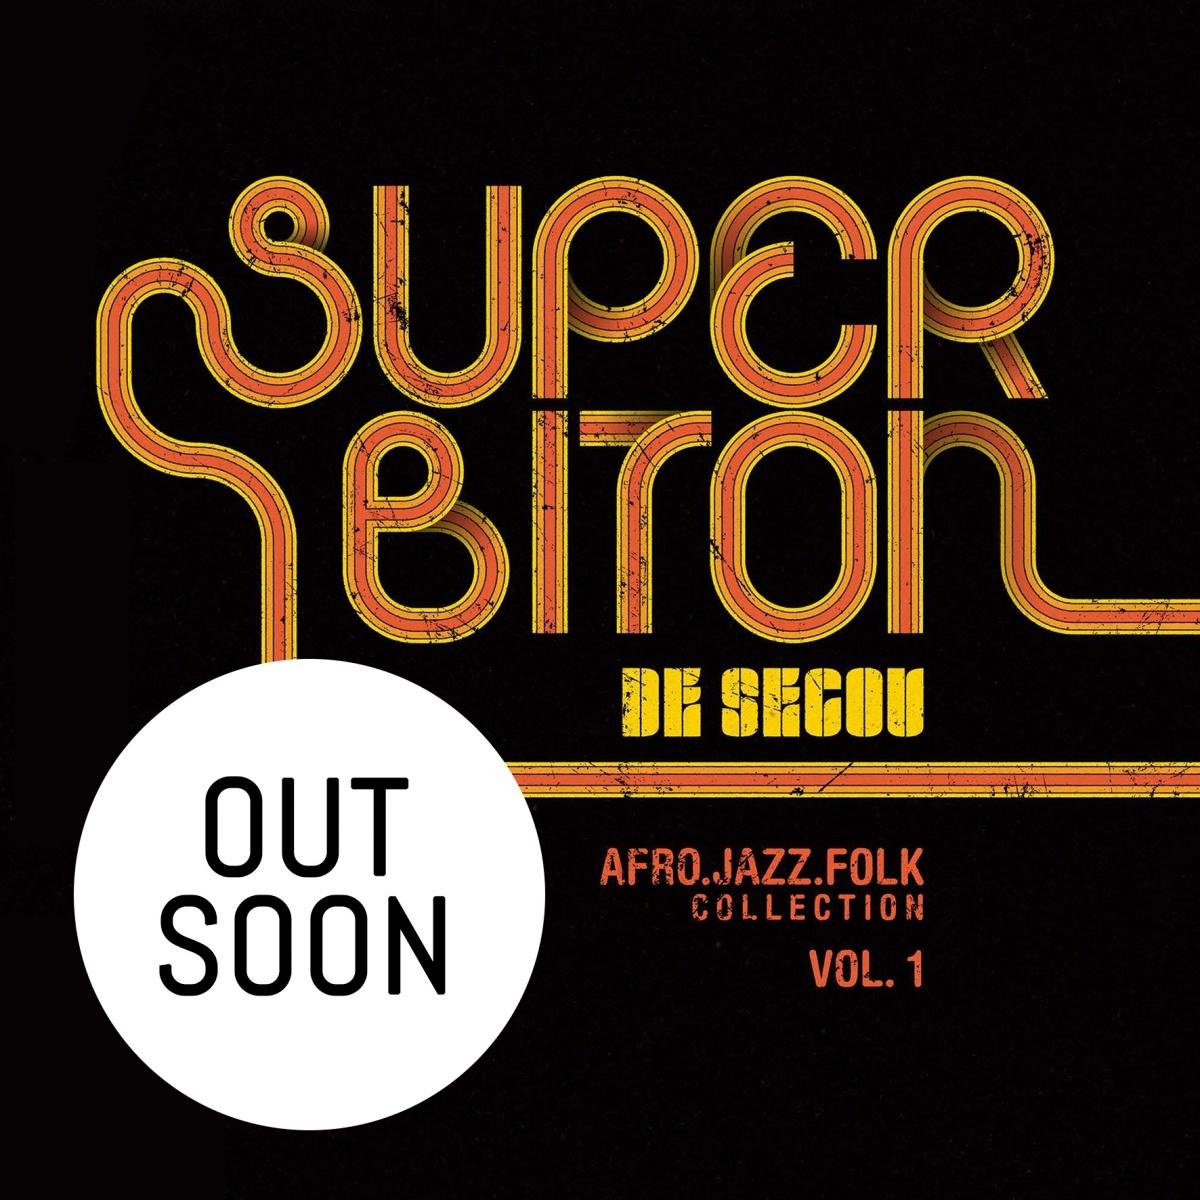 Super Biton Ségou - Afro Jazz Folk Collection Vol.1